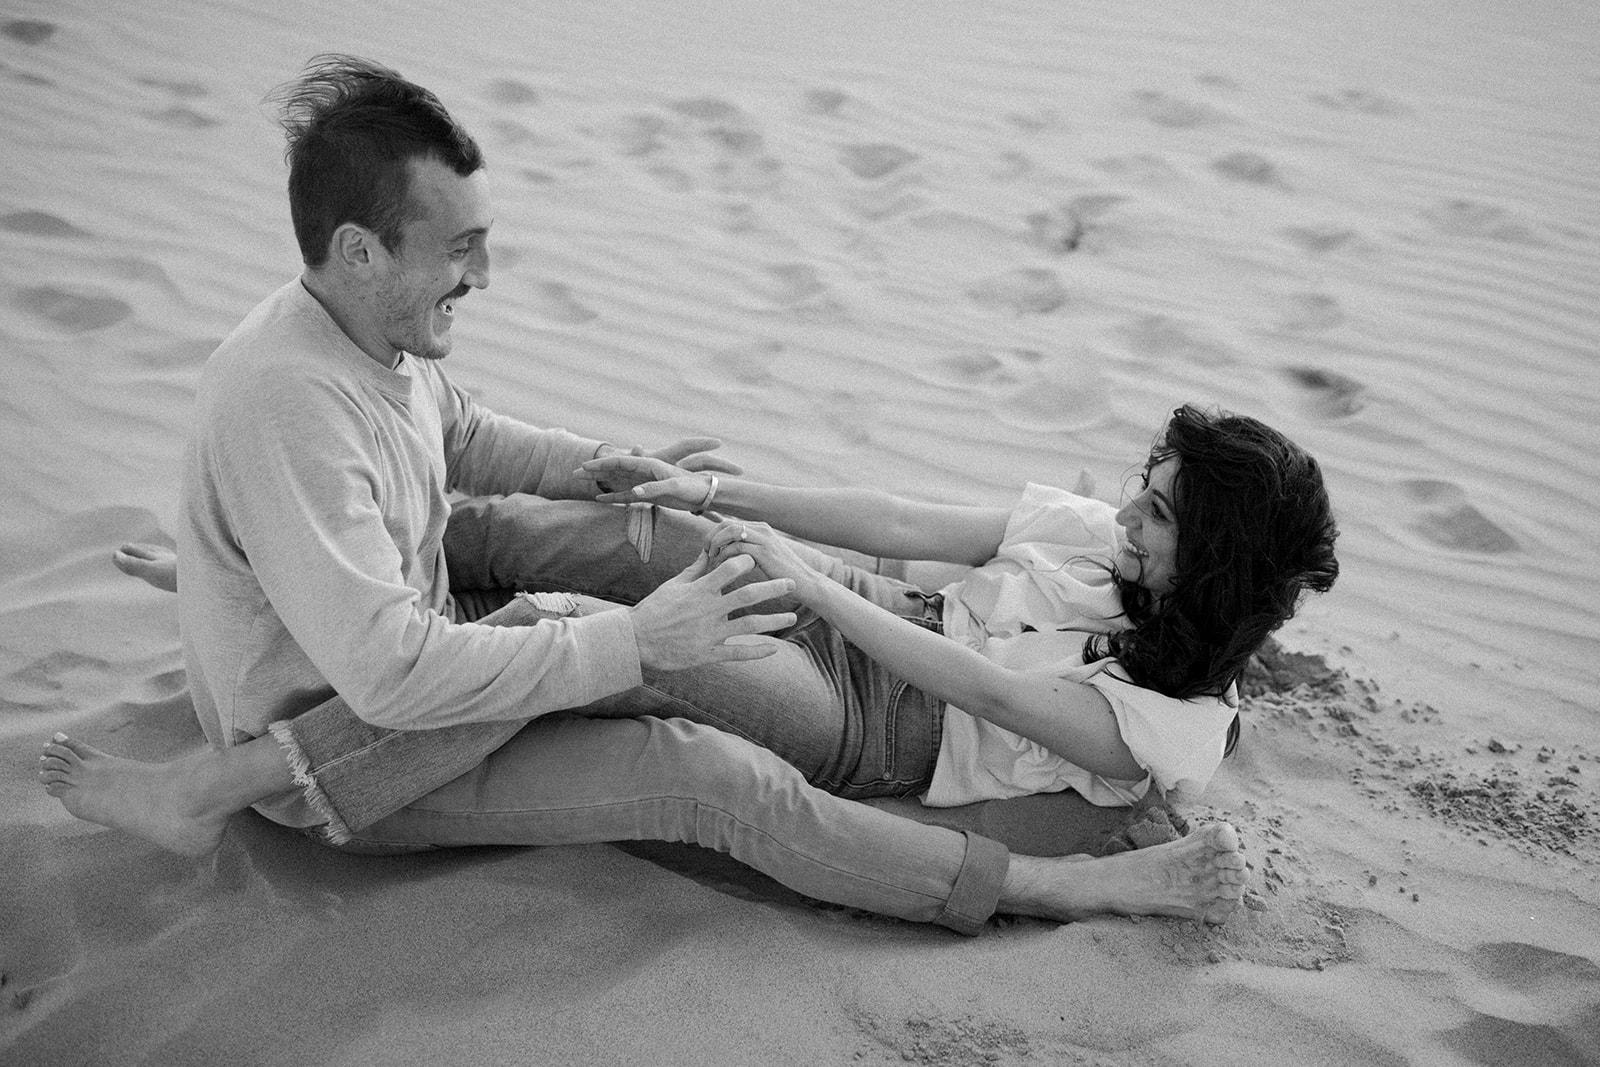 Imperial_Sand_Dunes_Linda_and_Sam_Dawn_Charles_Photographer-49.jpg